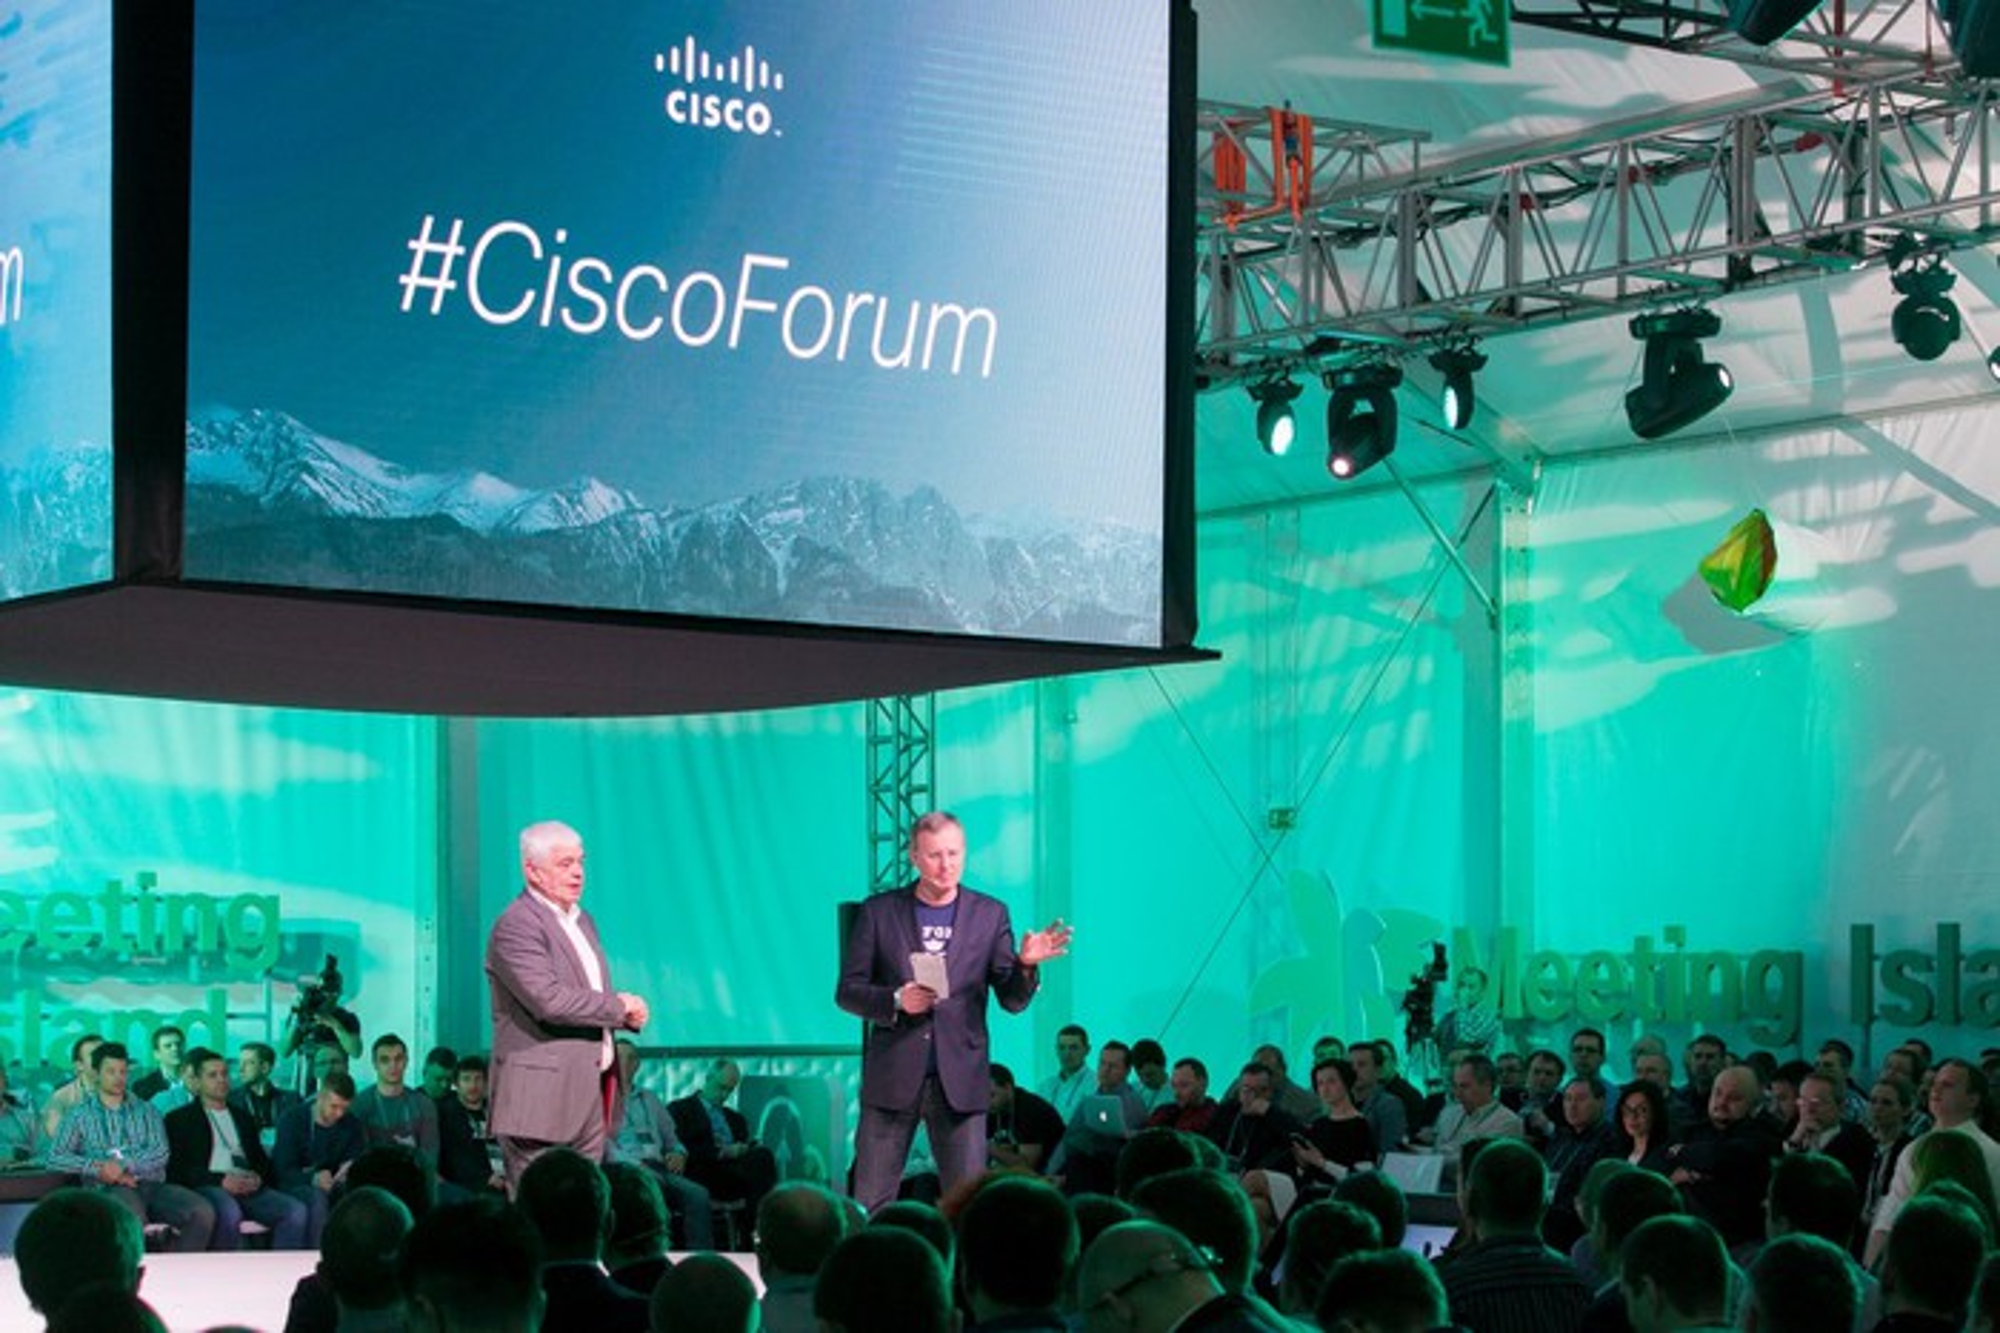 Cisco forum presentation by two executives.